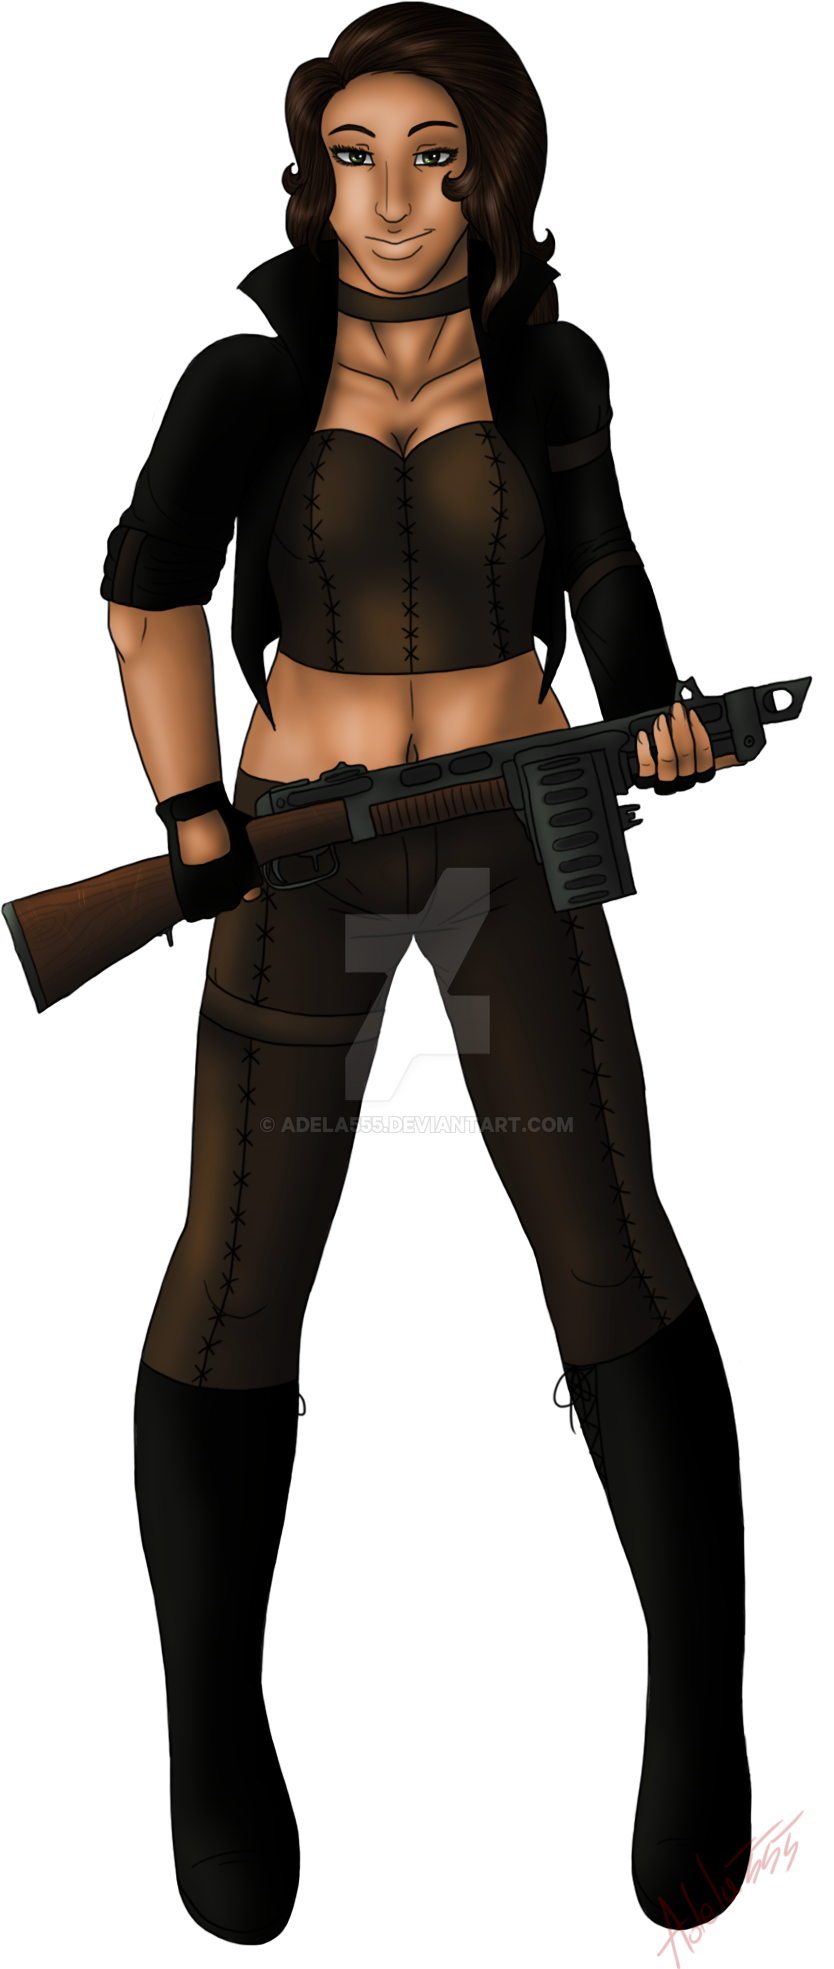 Black Betty by Adela555